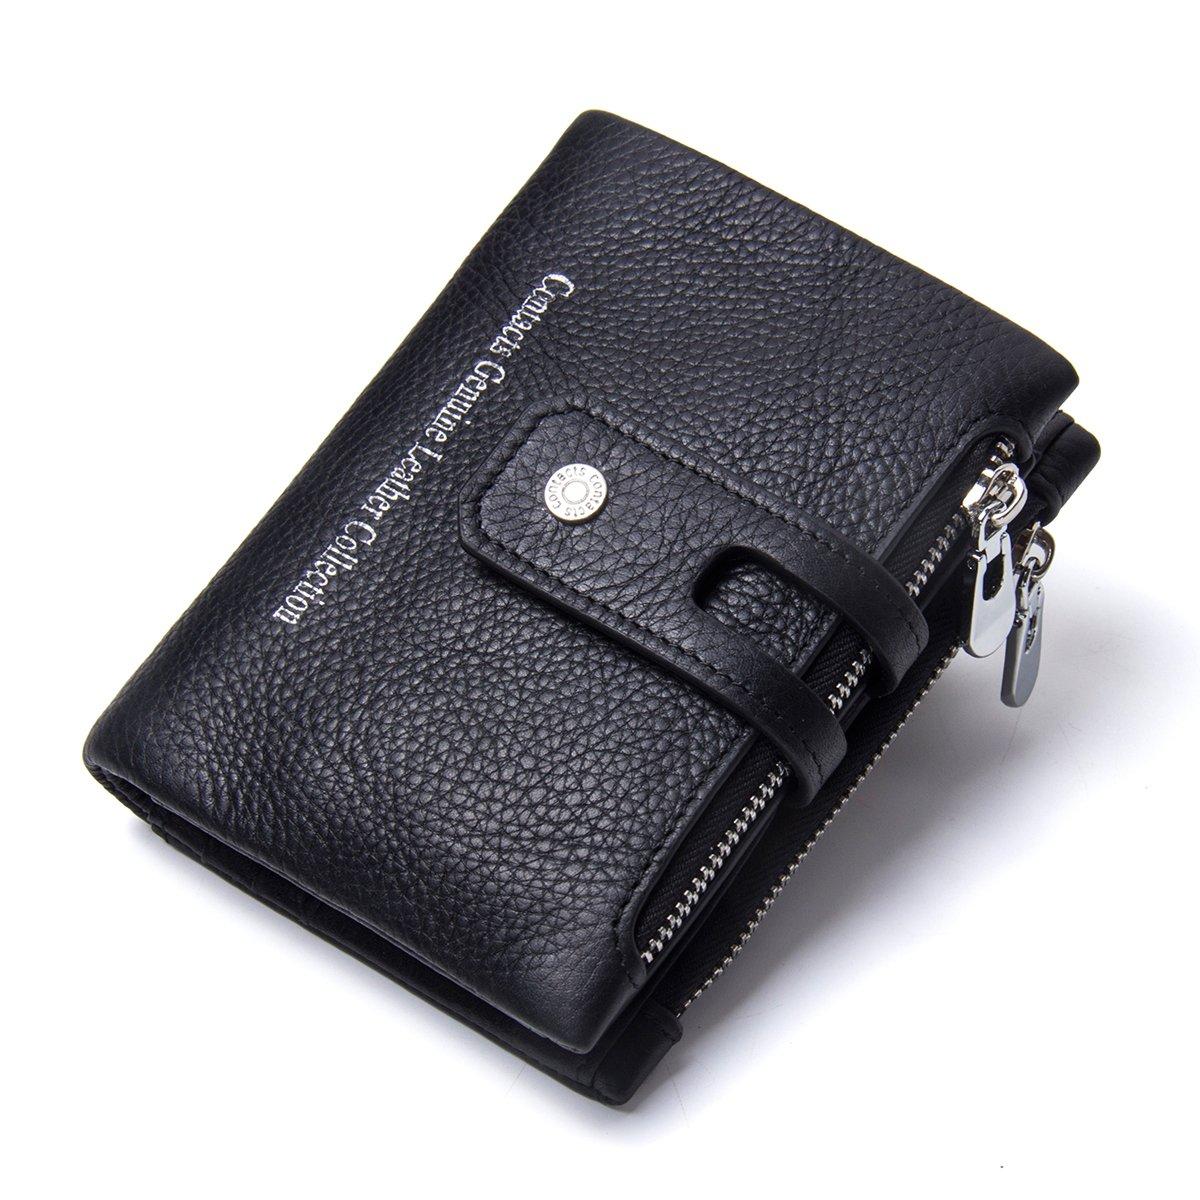 Contacts Hommes V/éritable Cuir Bifold Double Zipper Coin Pocket Porte-Monnaie Caf/é Noir